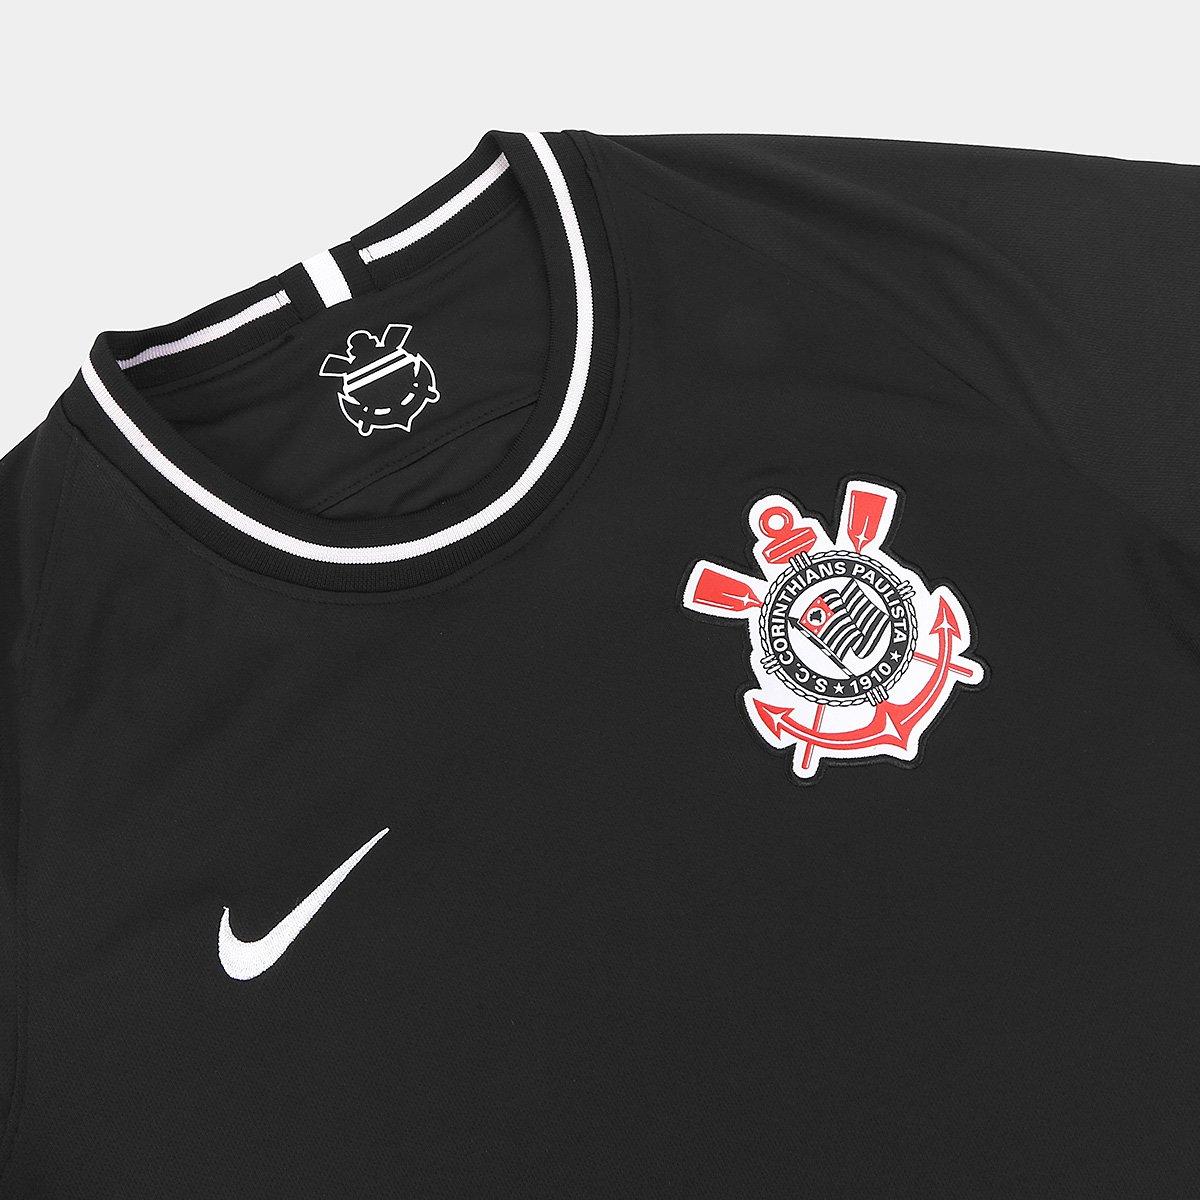 Camisa Corinthians II 19/20 s/nº Torcedor Nike Masculina - Tam: P - 3